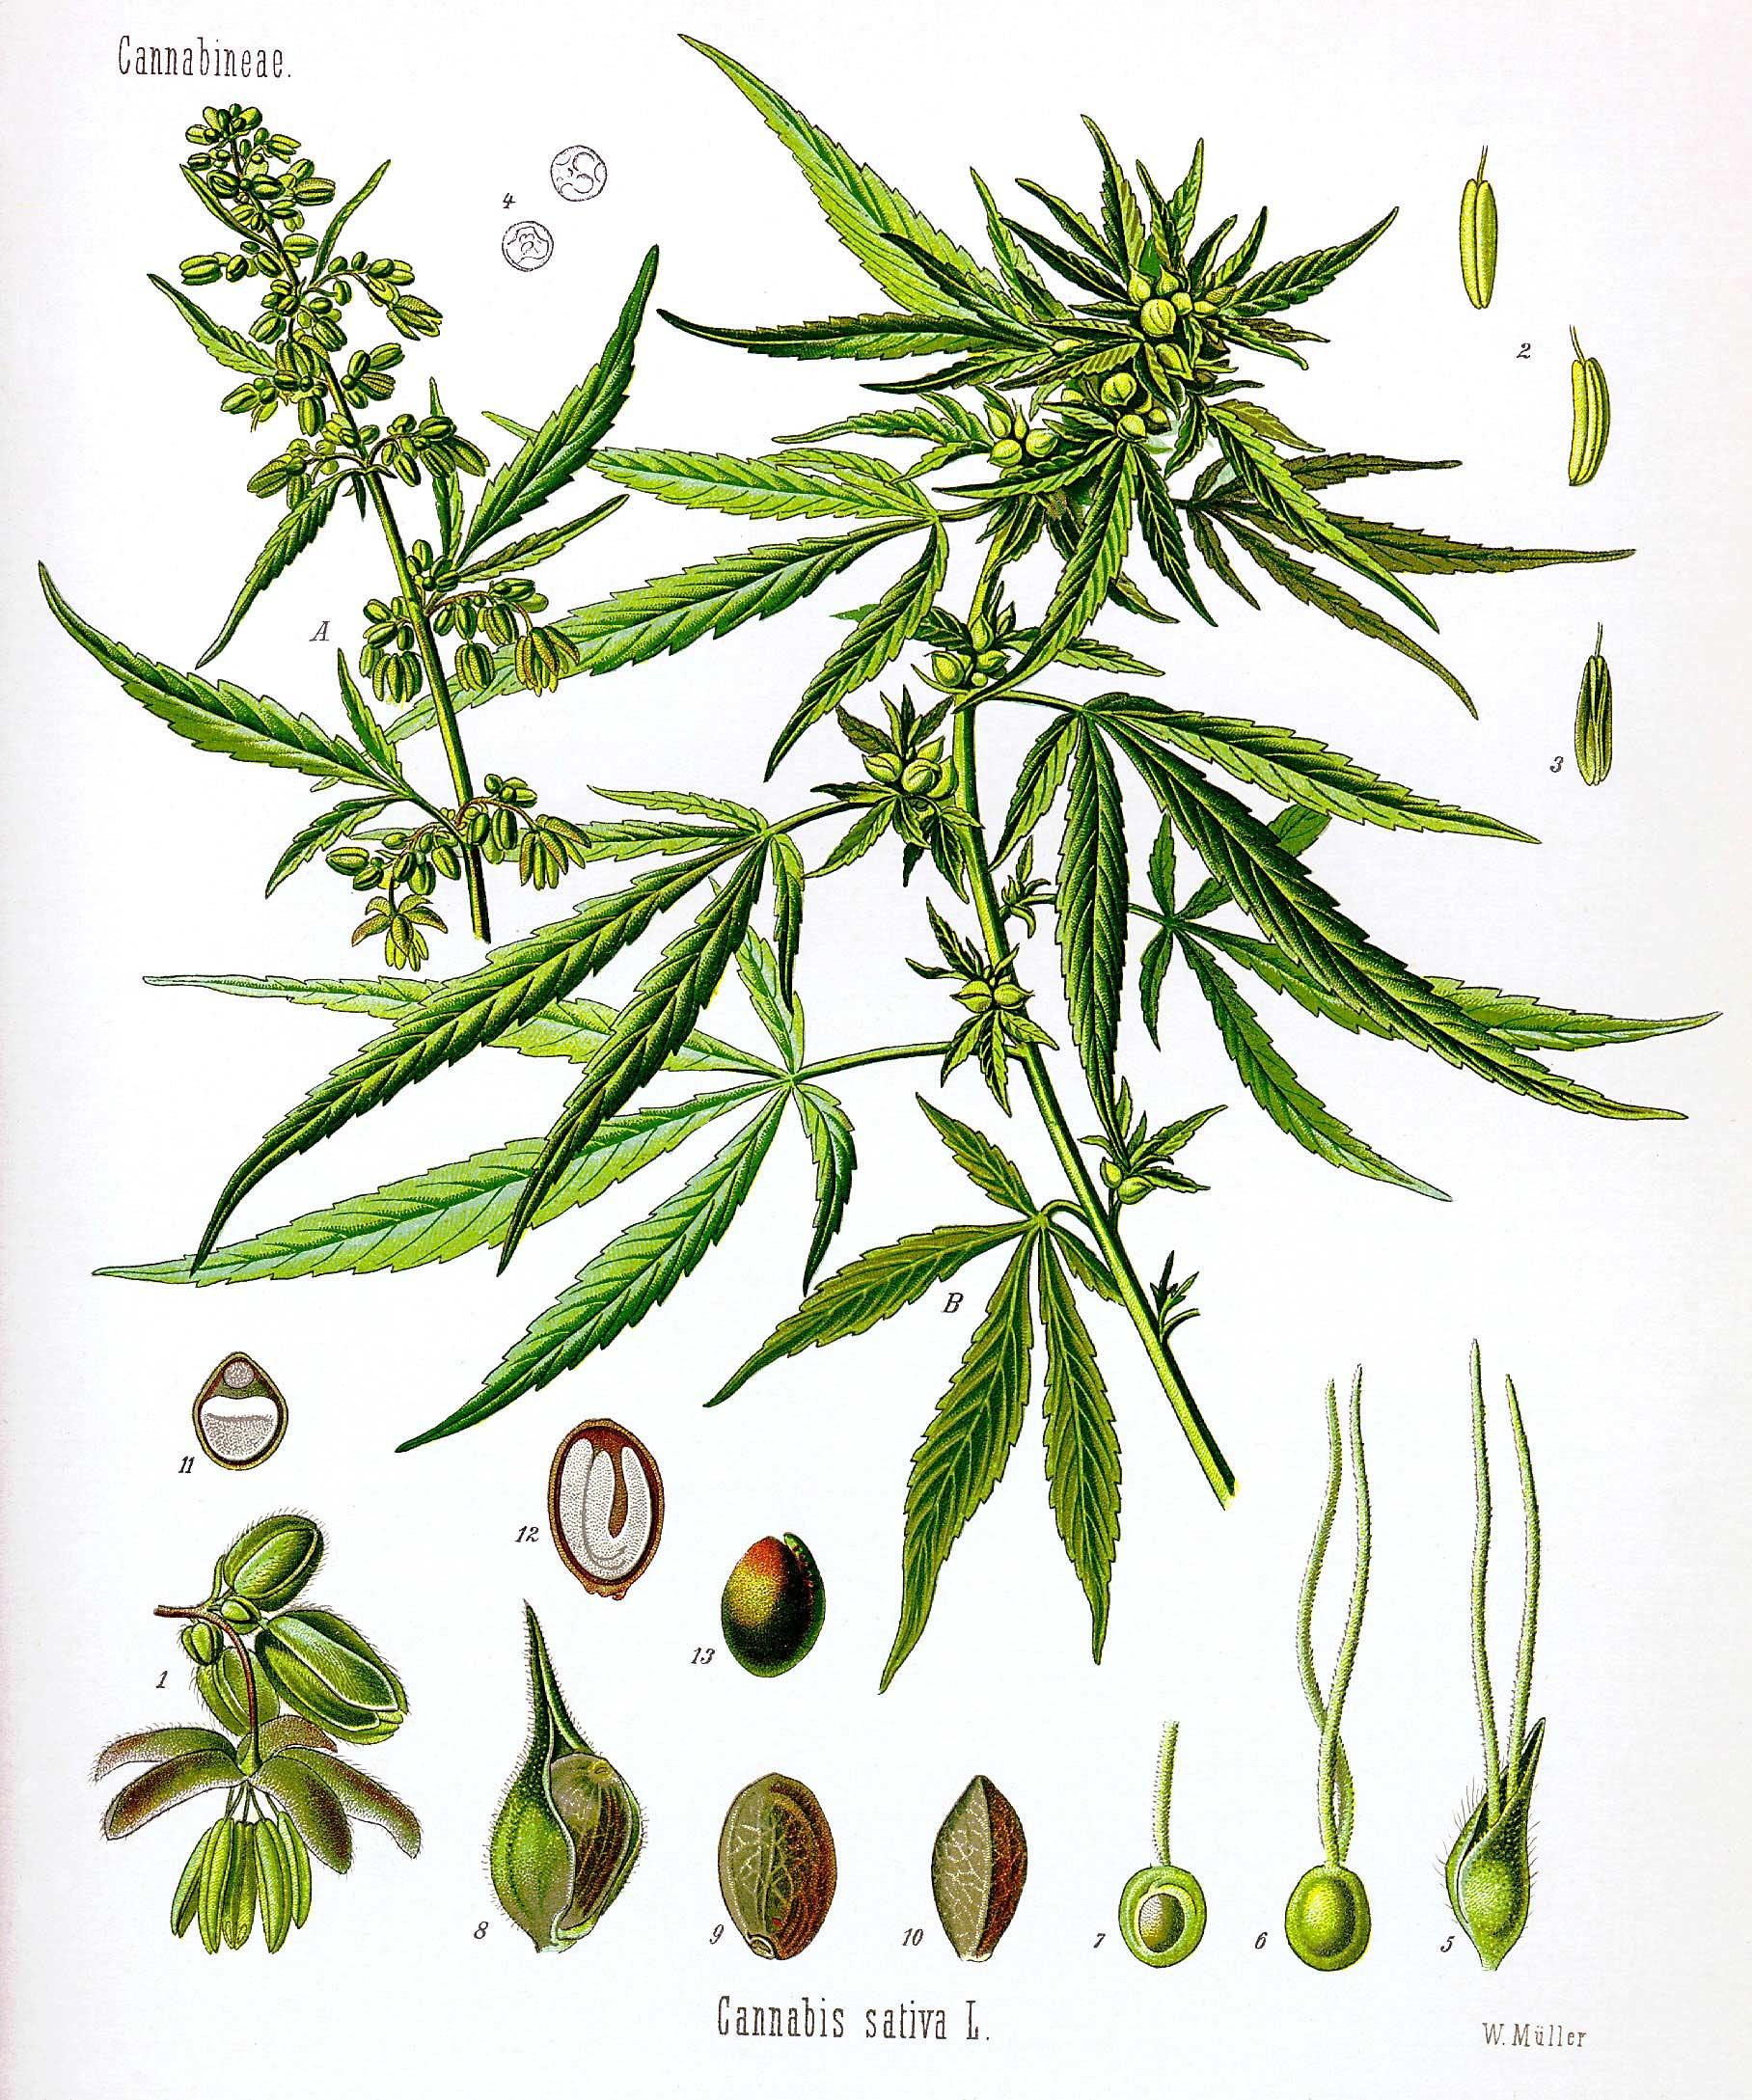 MARIJUANAAAAAAaaaaaaaaaaaaa marijuana?